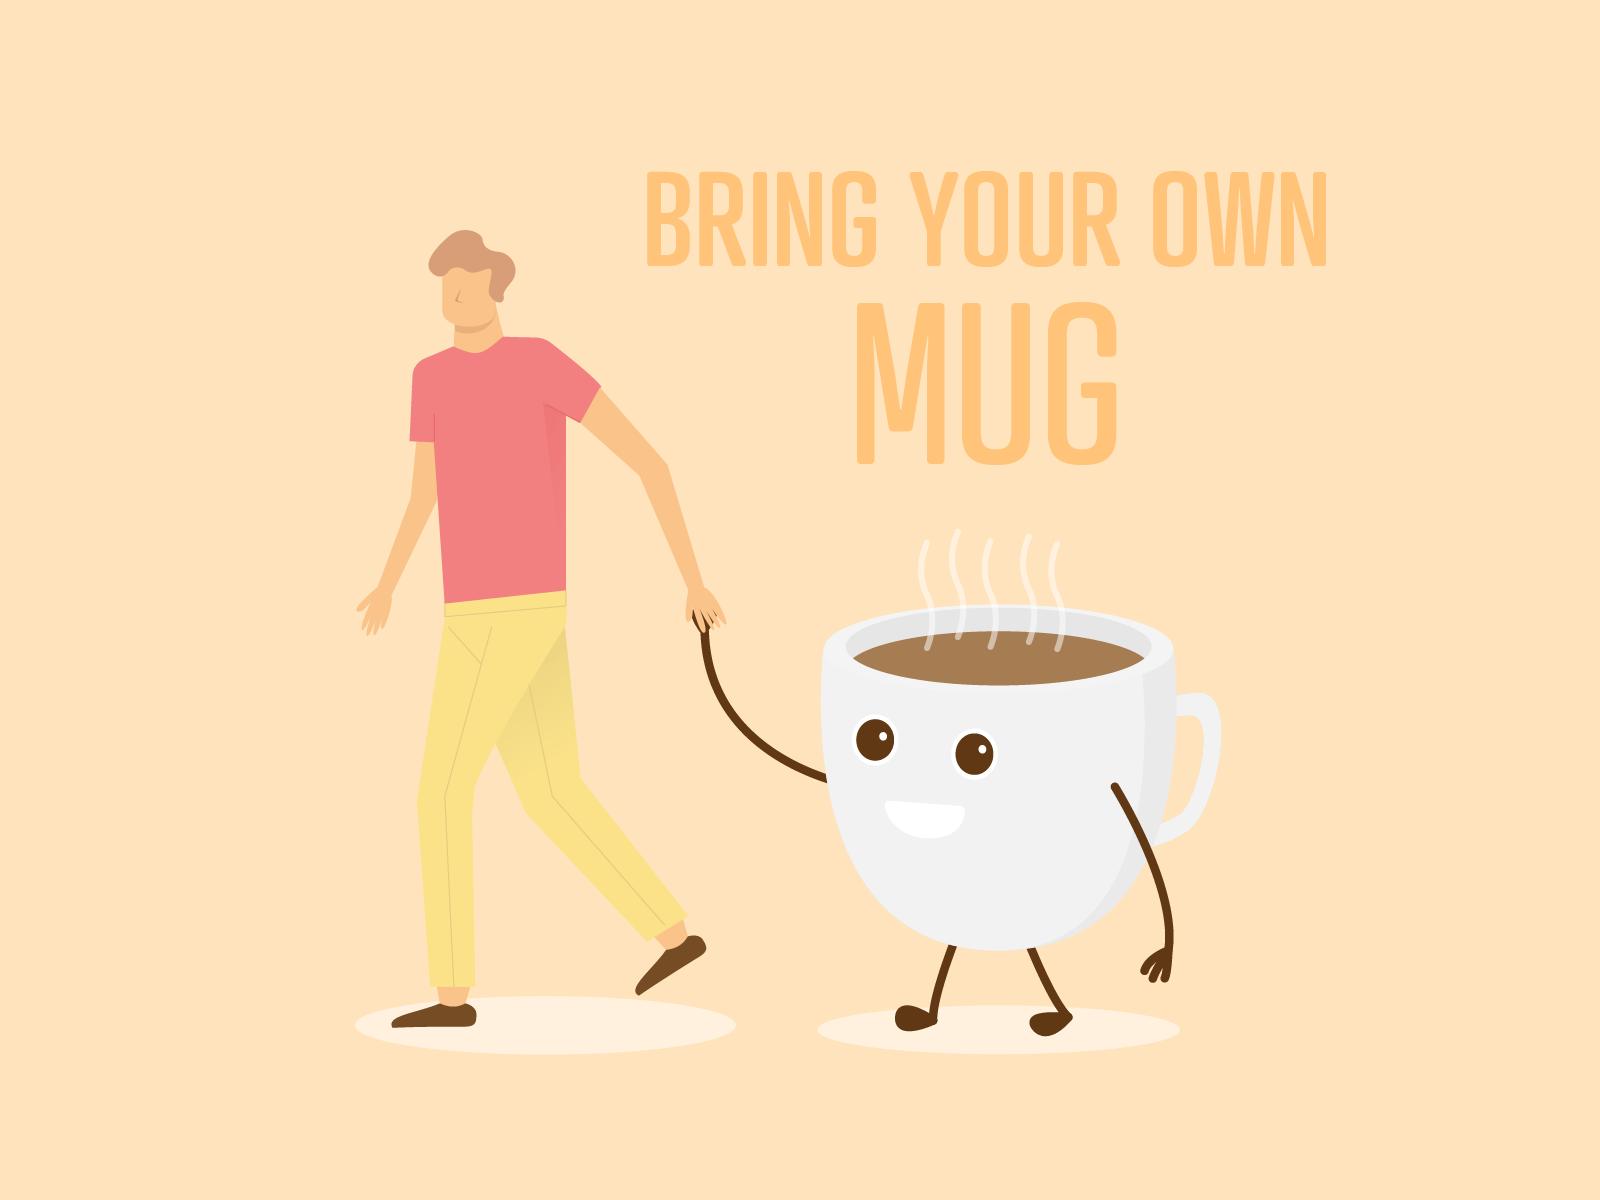 bring-your-own-mug